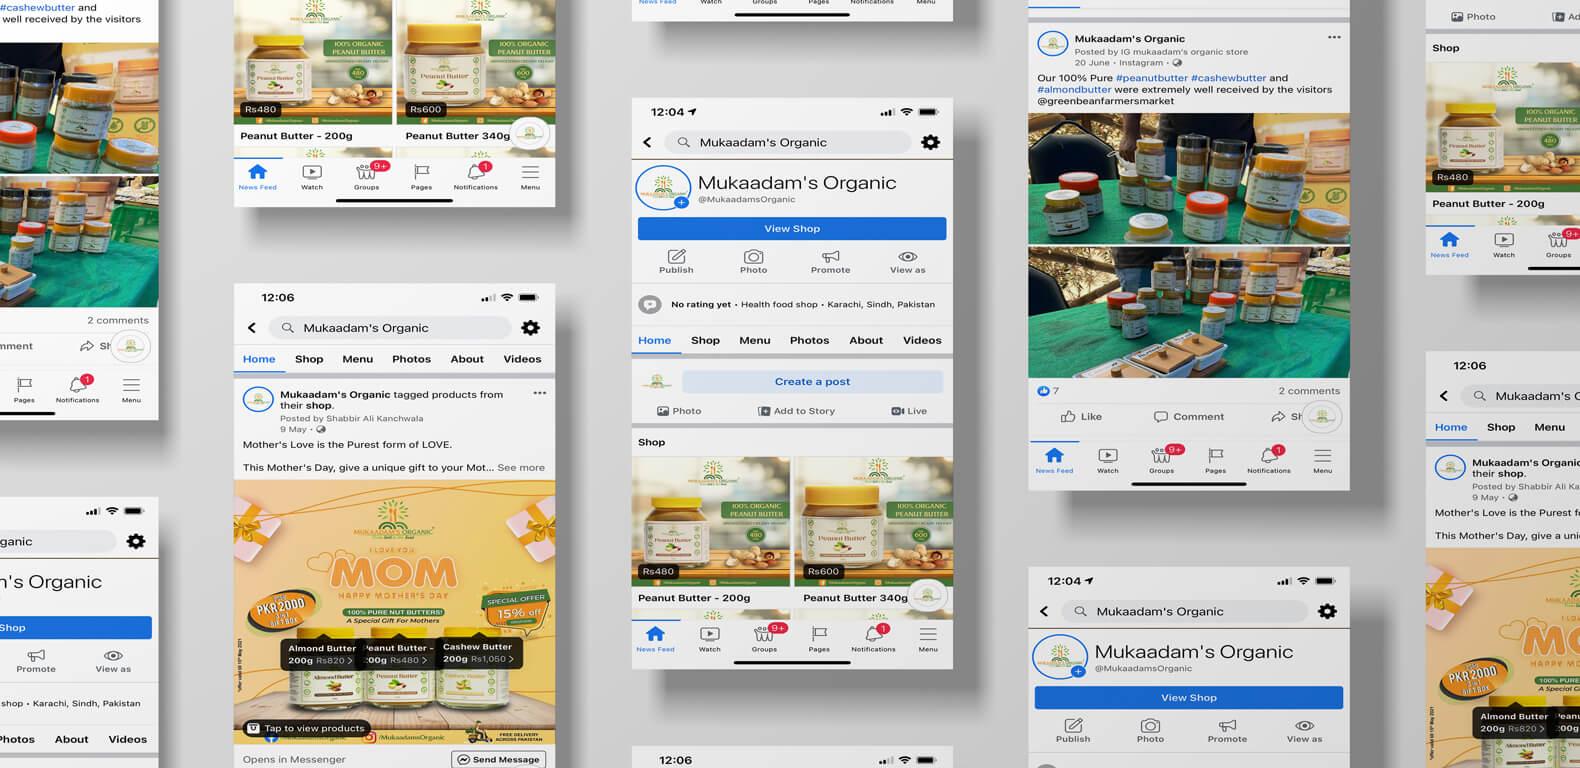 social-media-marketing-mukaadams-organic-facebook-feed-and-shop